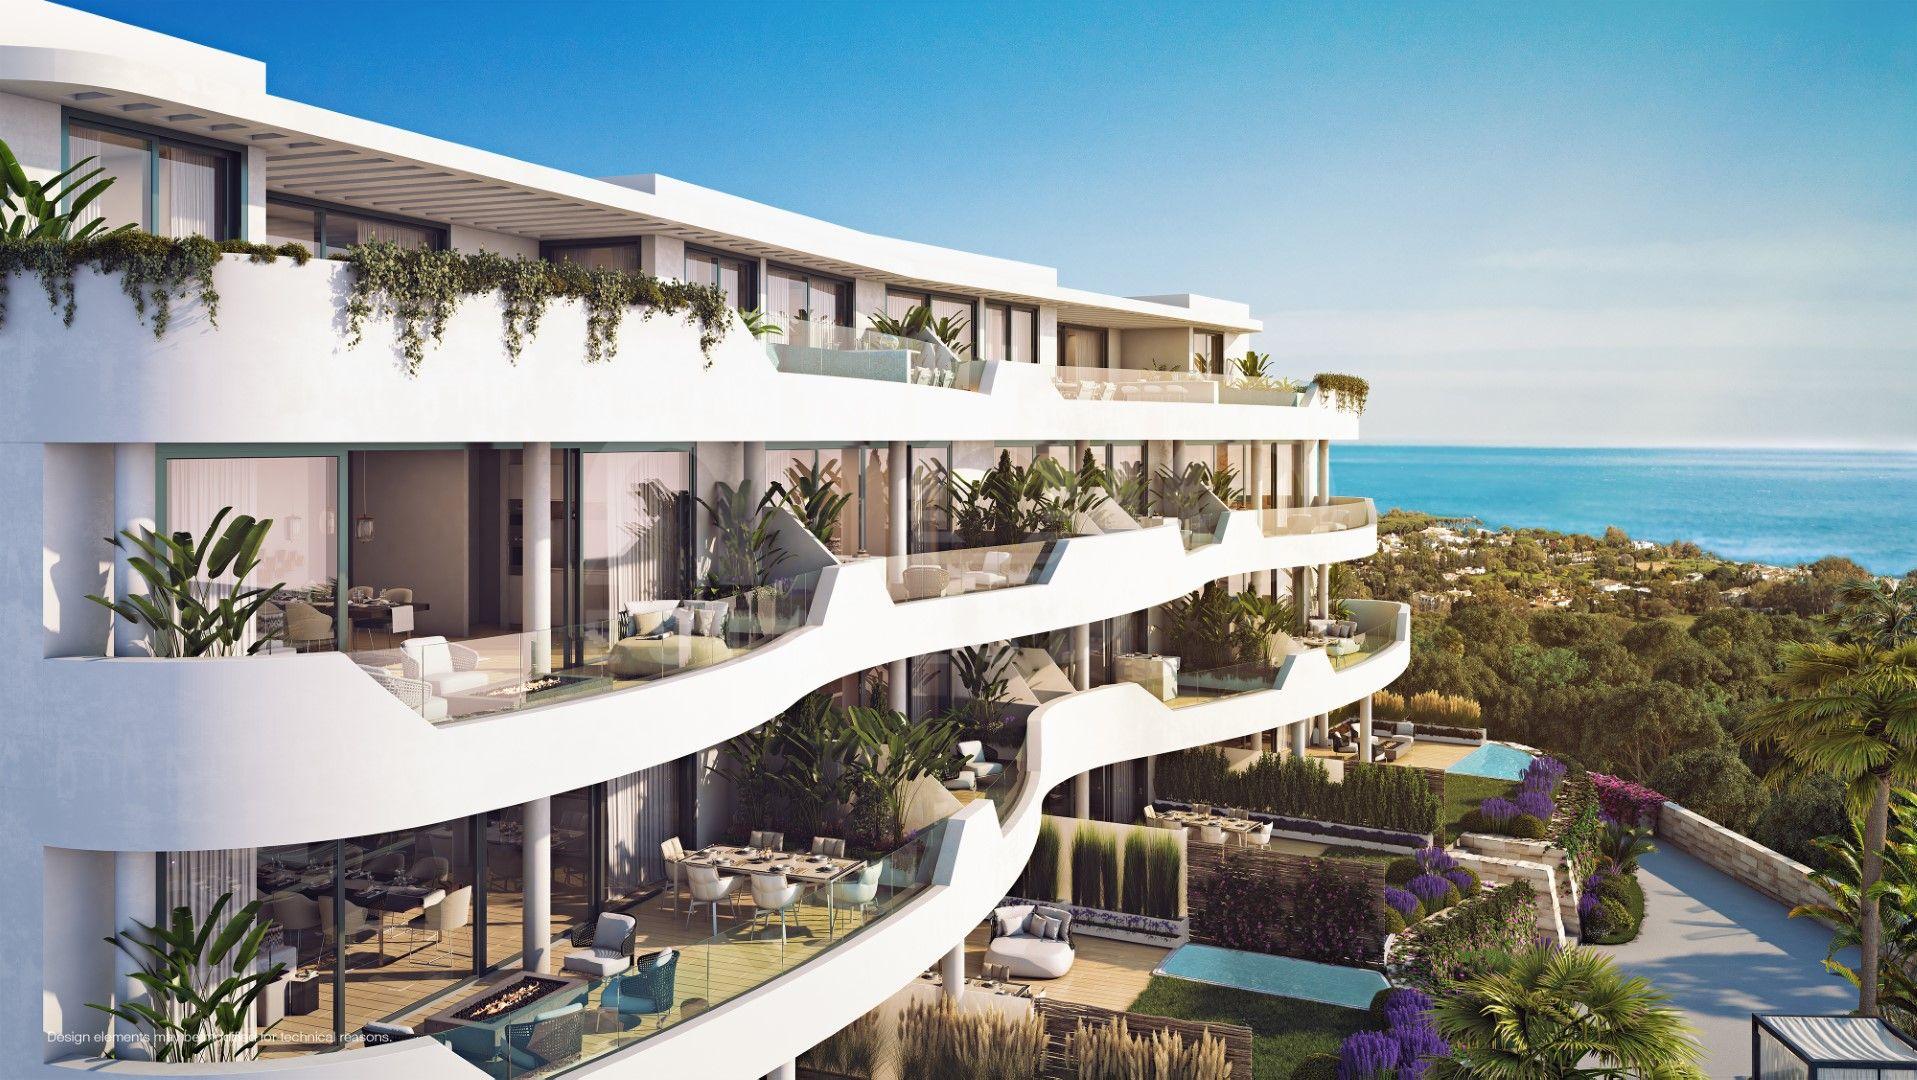 Higueron West, new property development in Benalmadena Costa, Benalmadena.